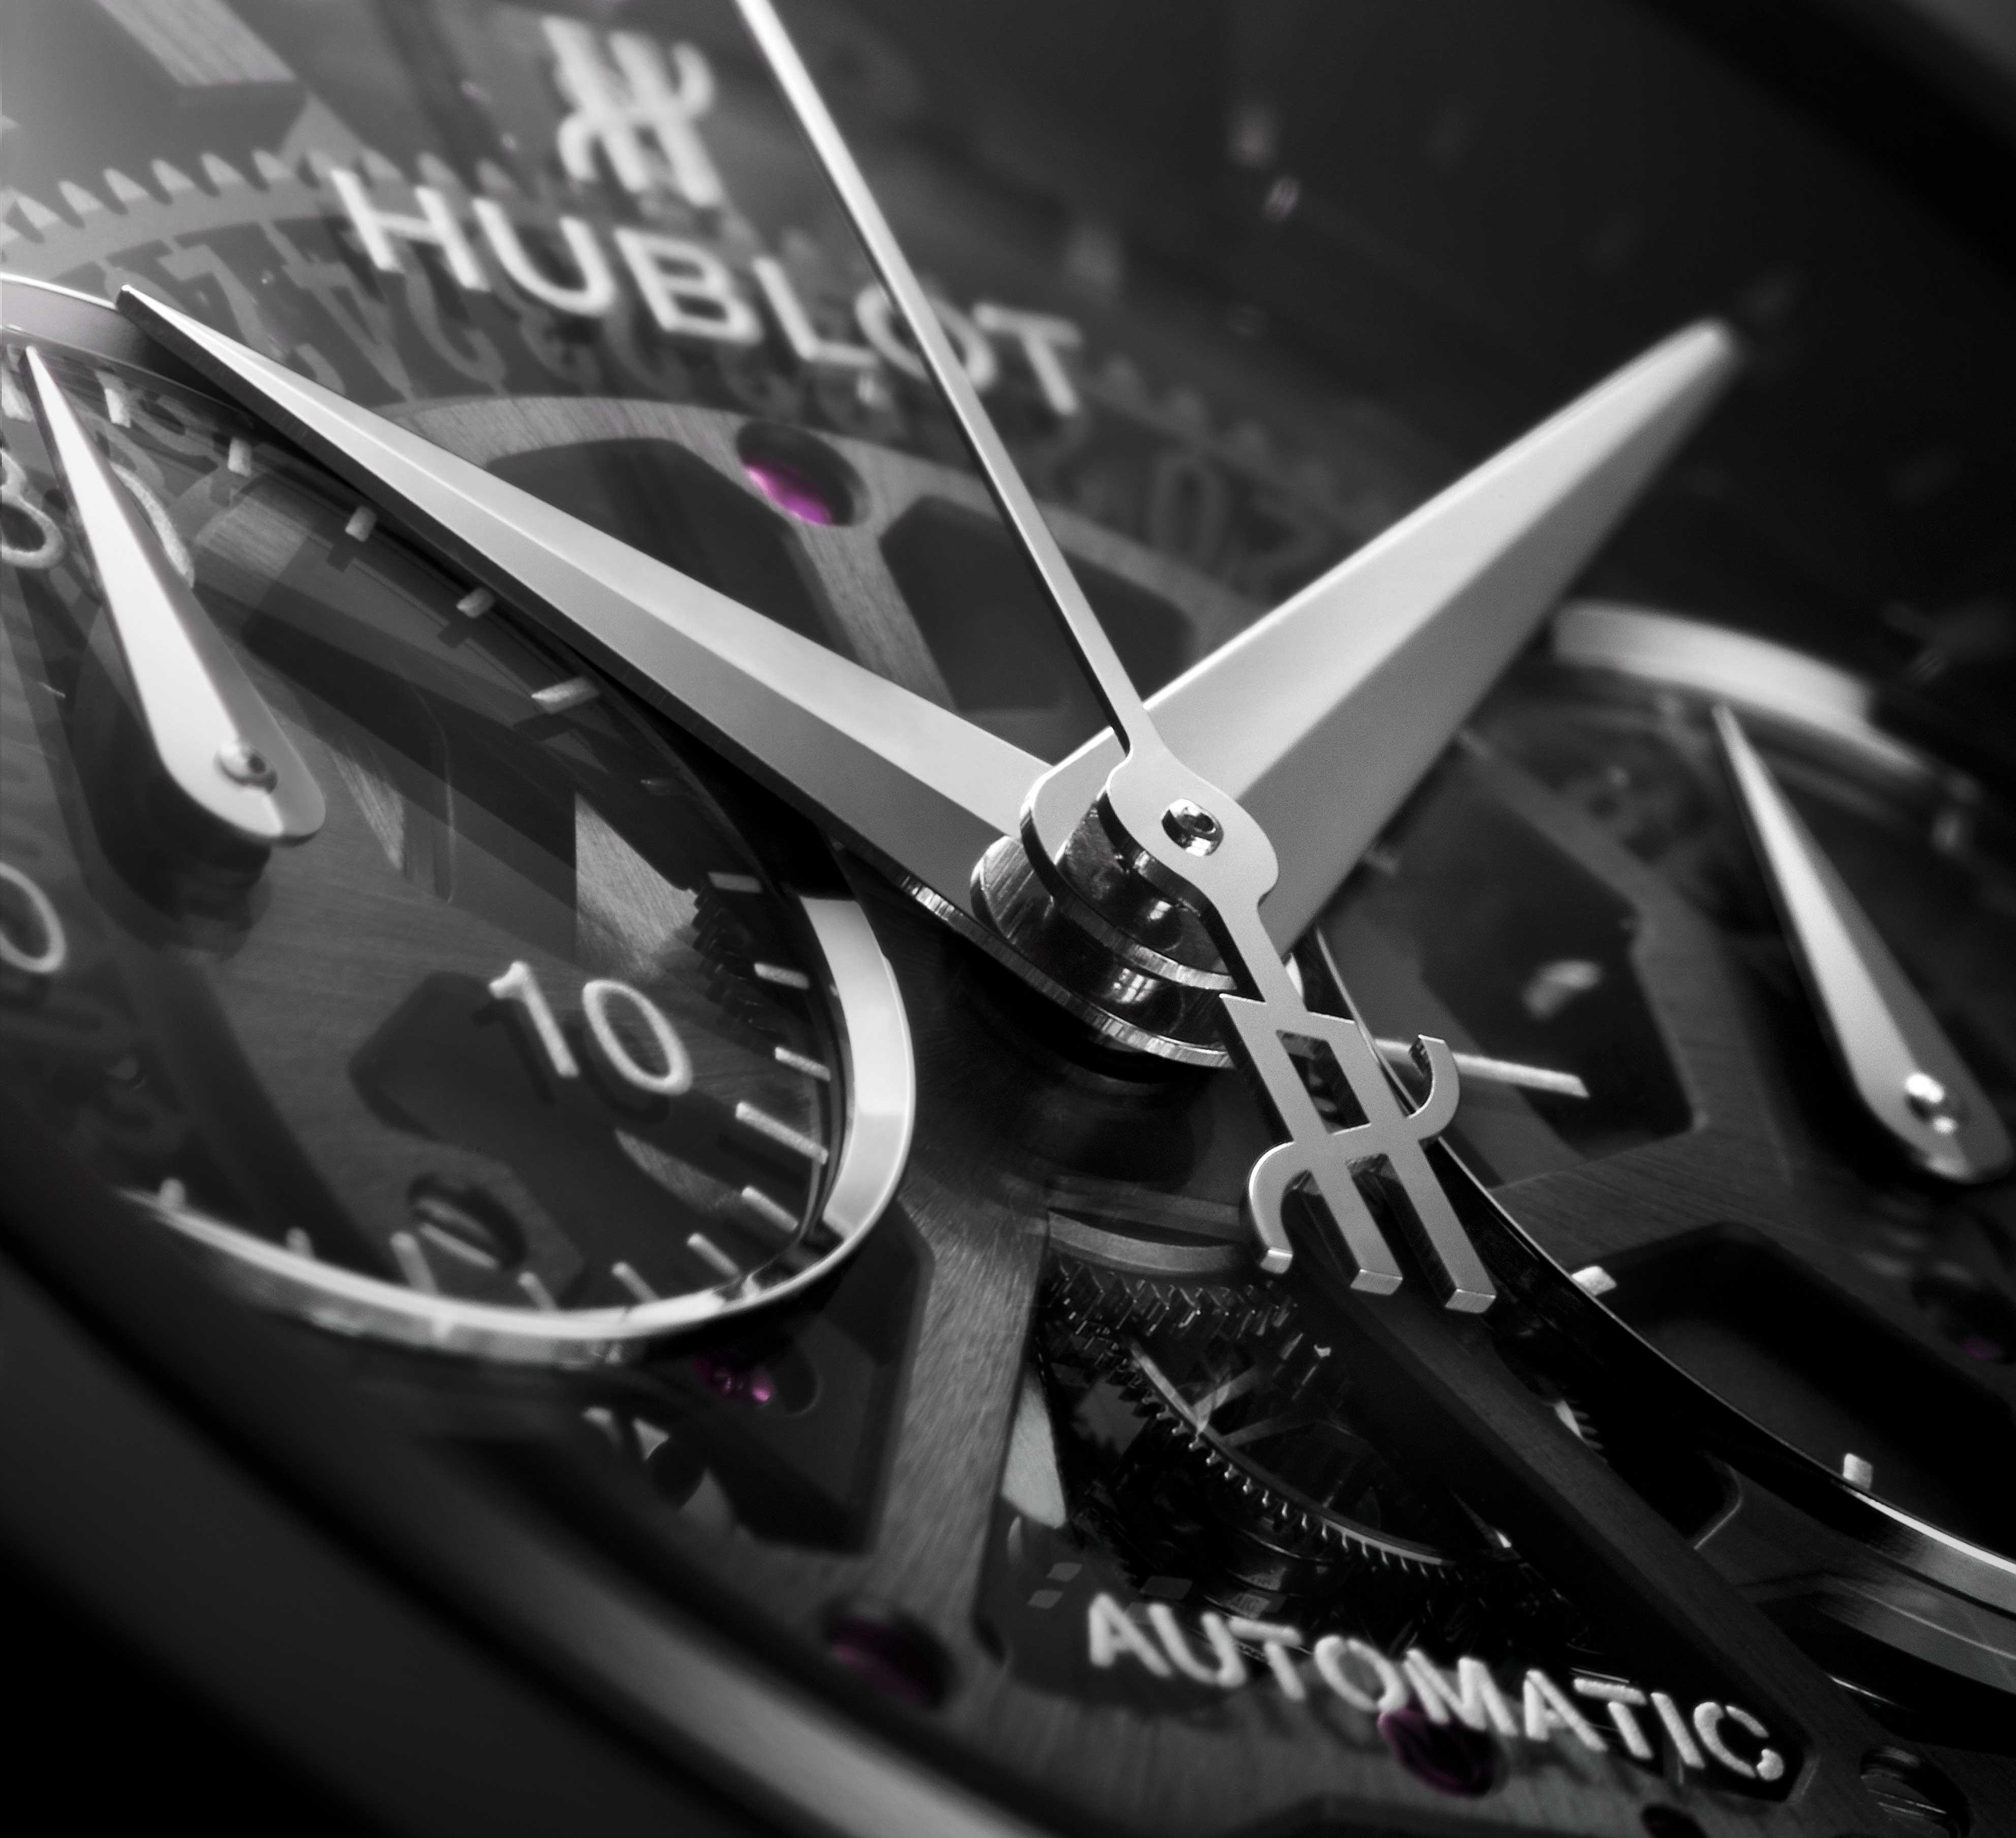 Hublot Classic Fusion Aerofusion Chronograph Orlinski